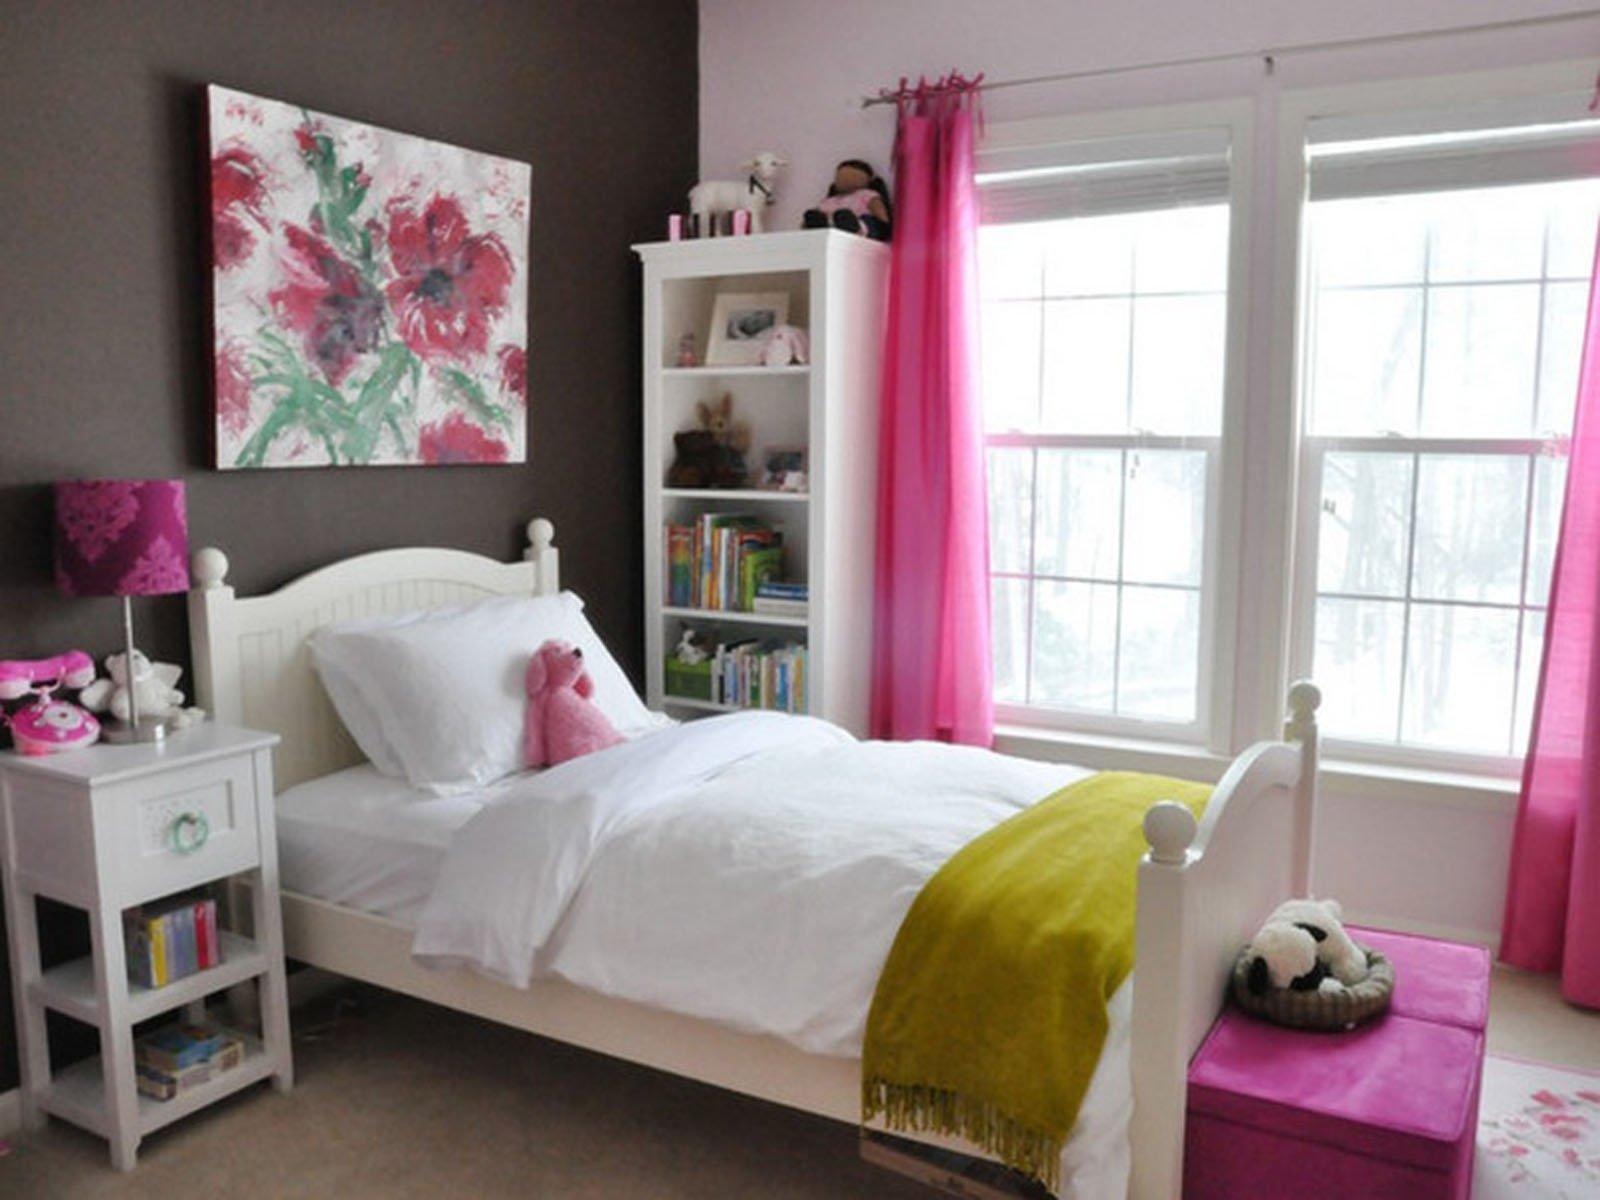 10 Great Teenage Girl Small Bedroom Ideas designs for teenage girl bedrooms small bedroom ideas for teenage 3 2020